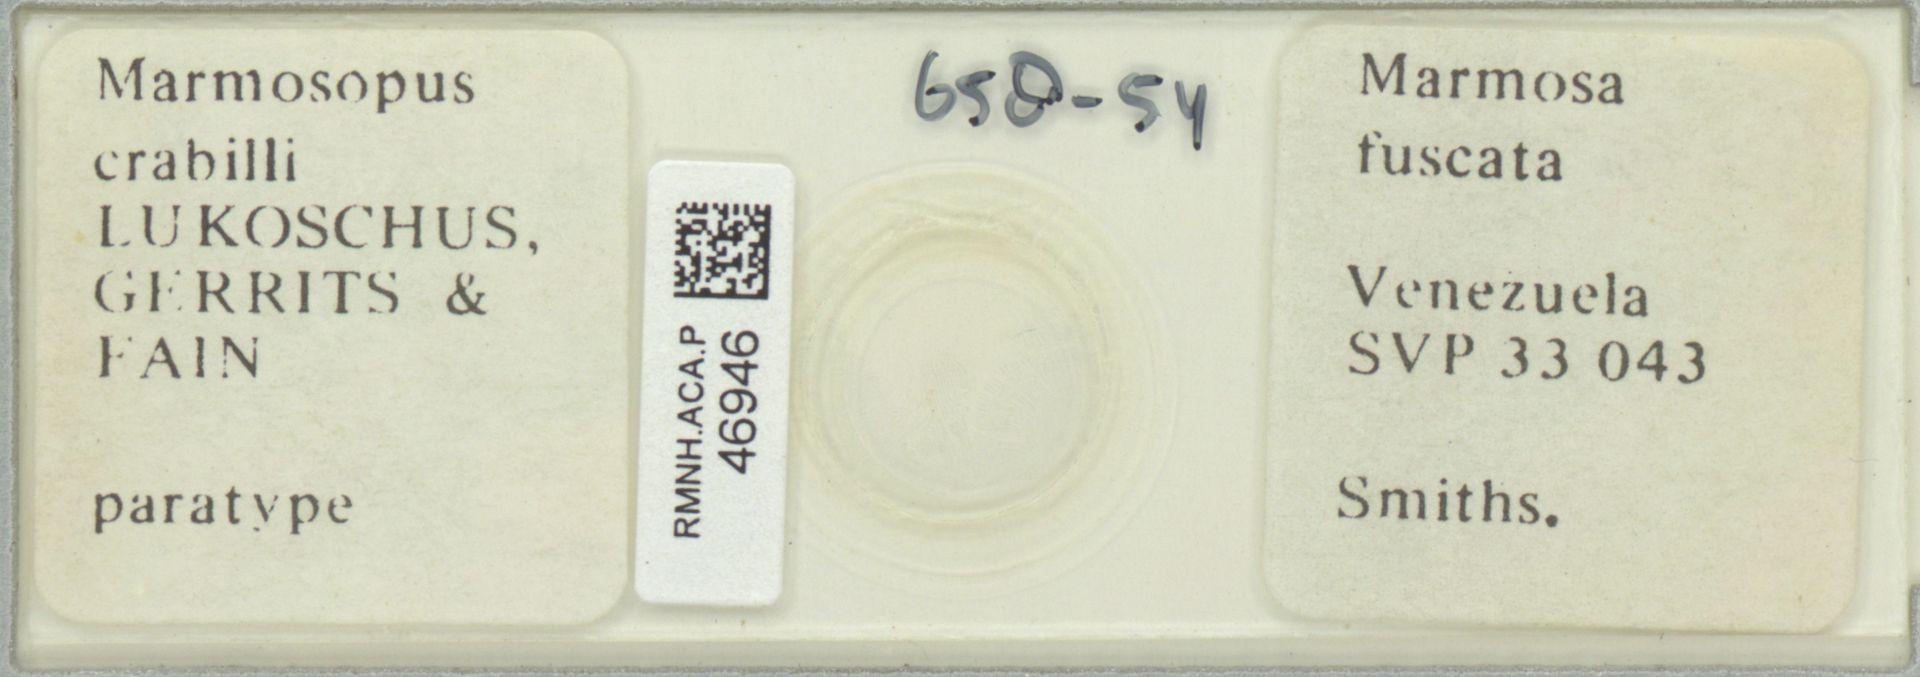 RMNH.ACA.P.46946 | Marmosopus crabilli Lukoschus, Gerrits & Fain